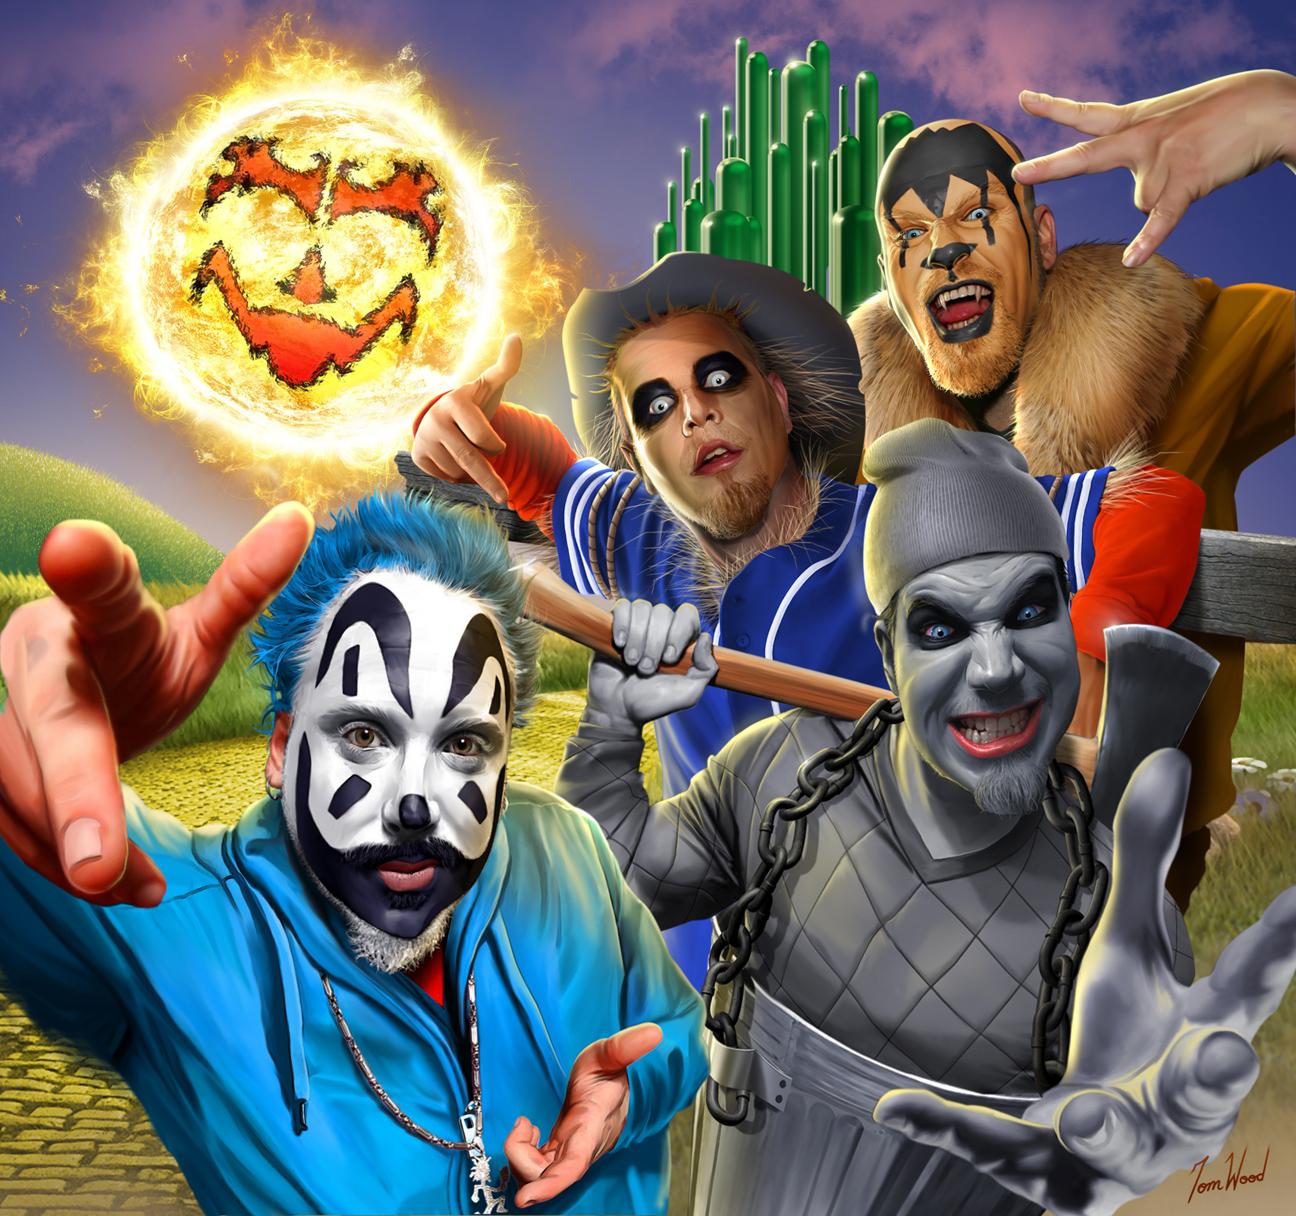 Rock Pop Insane Clown Posse Icp Violent J Wizard Of The Hood Cd